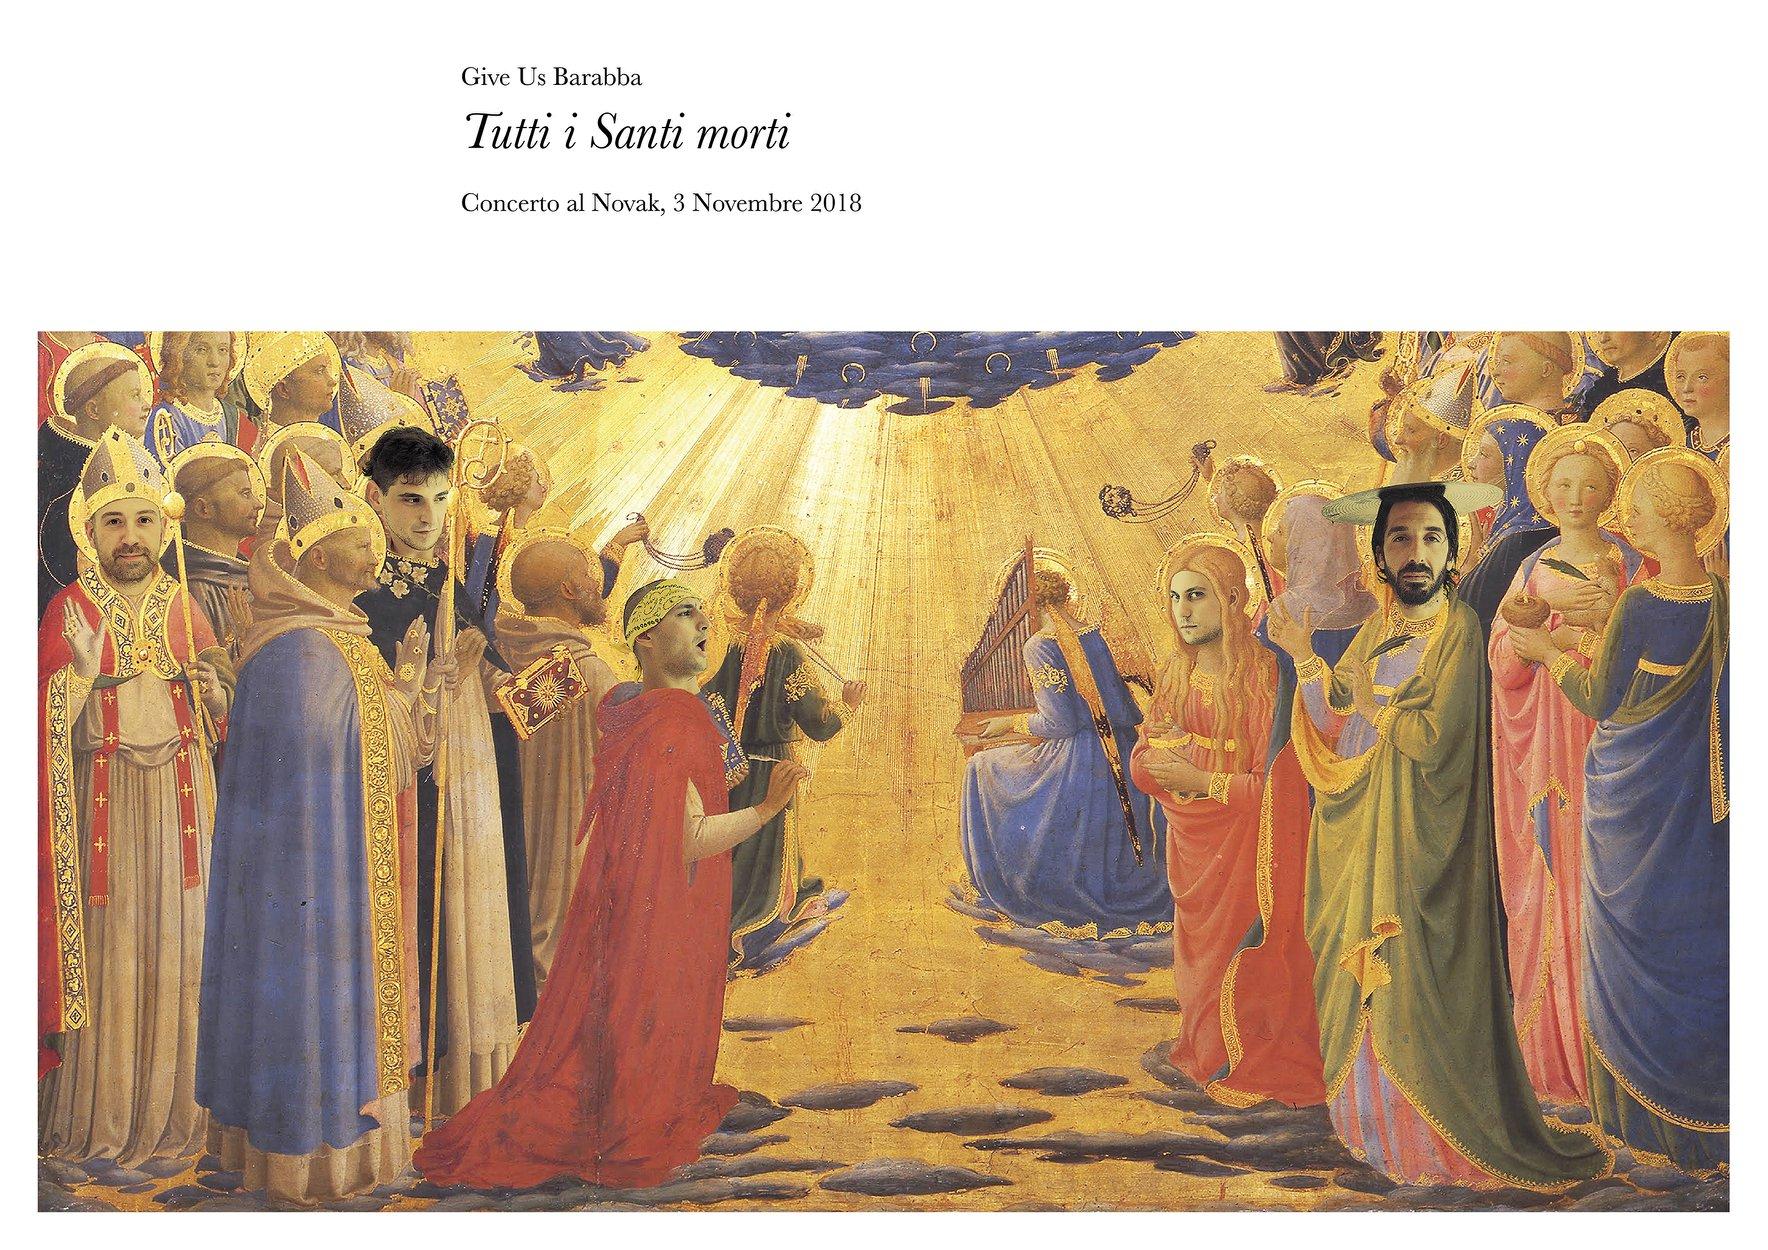 Tutti i Santi Morti | Give Us Barabba at Novak